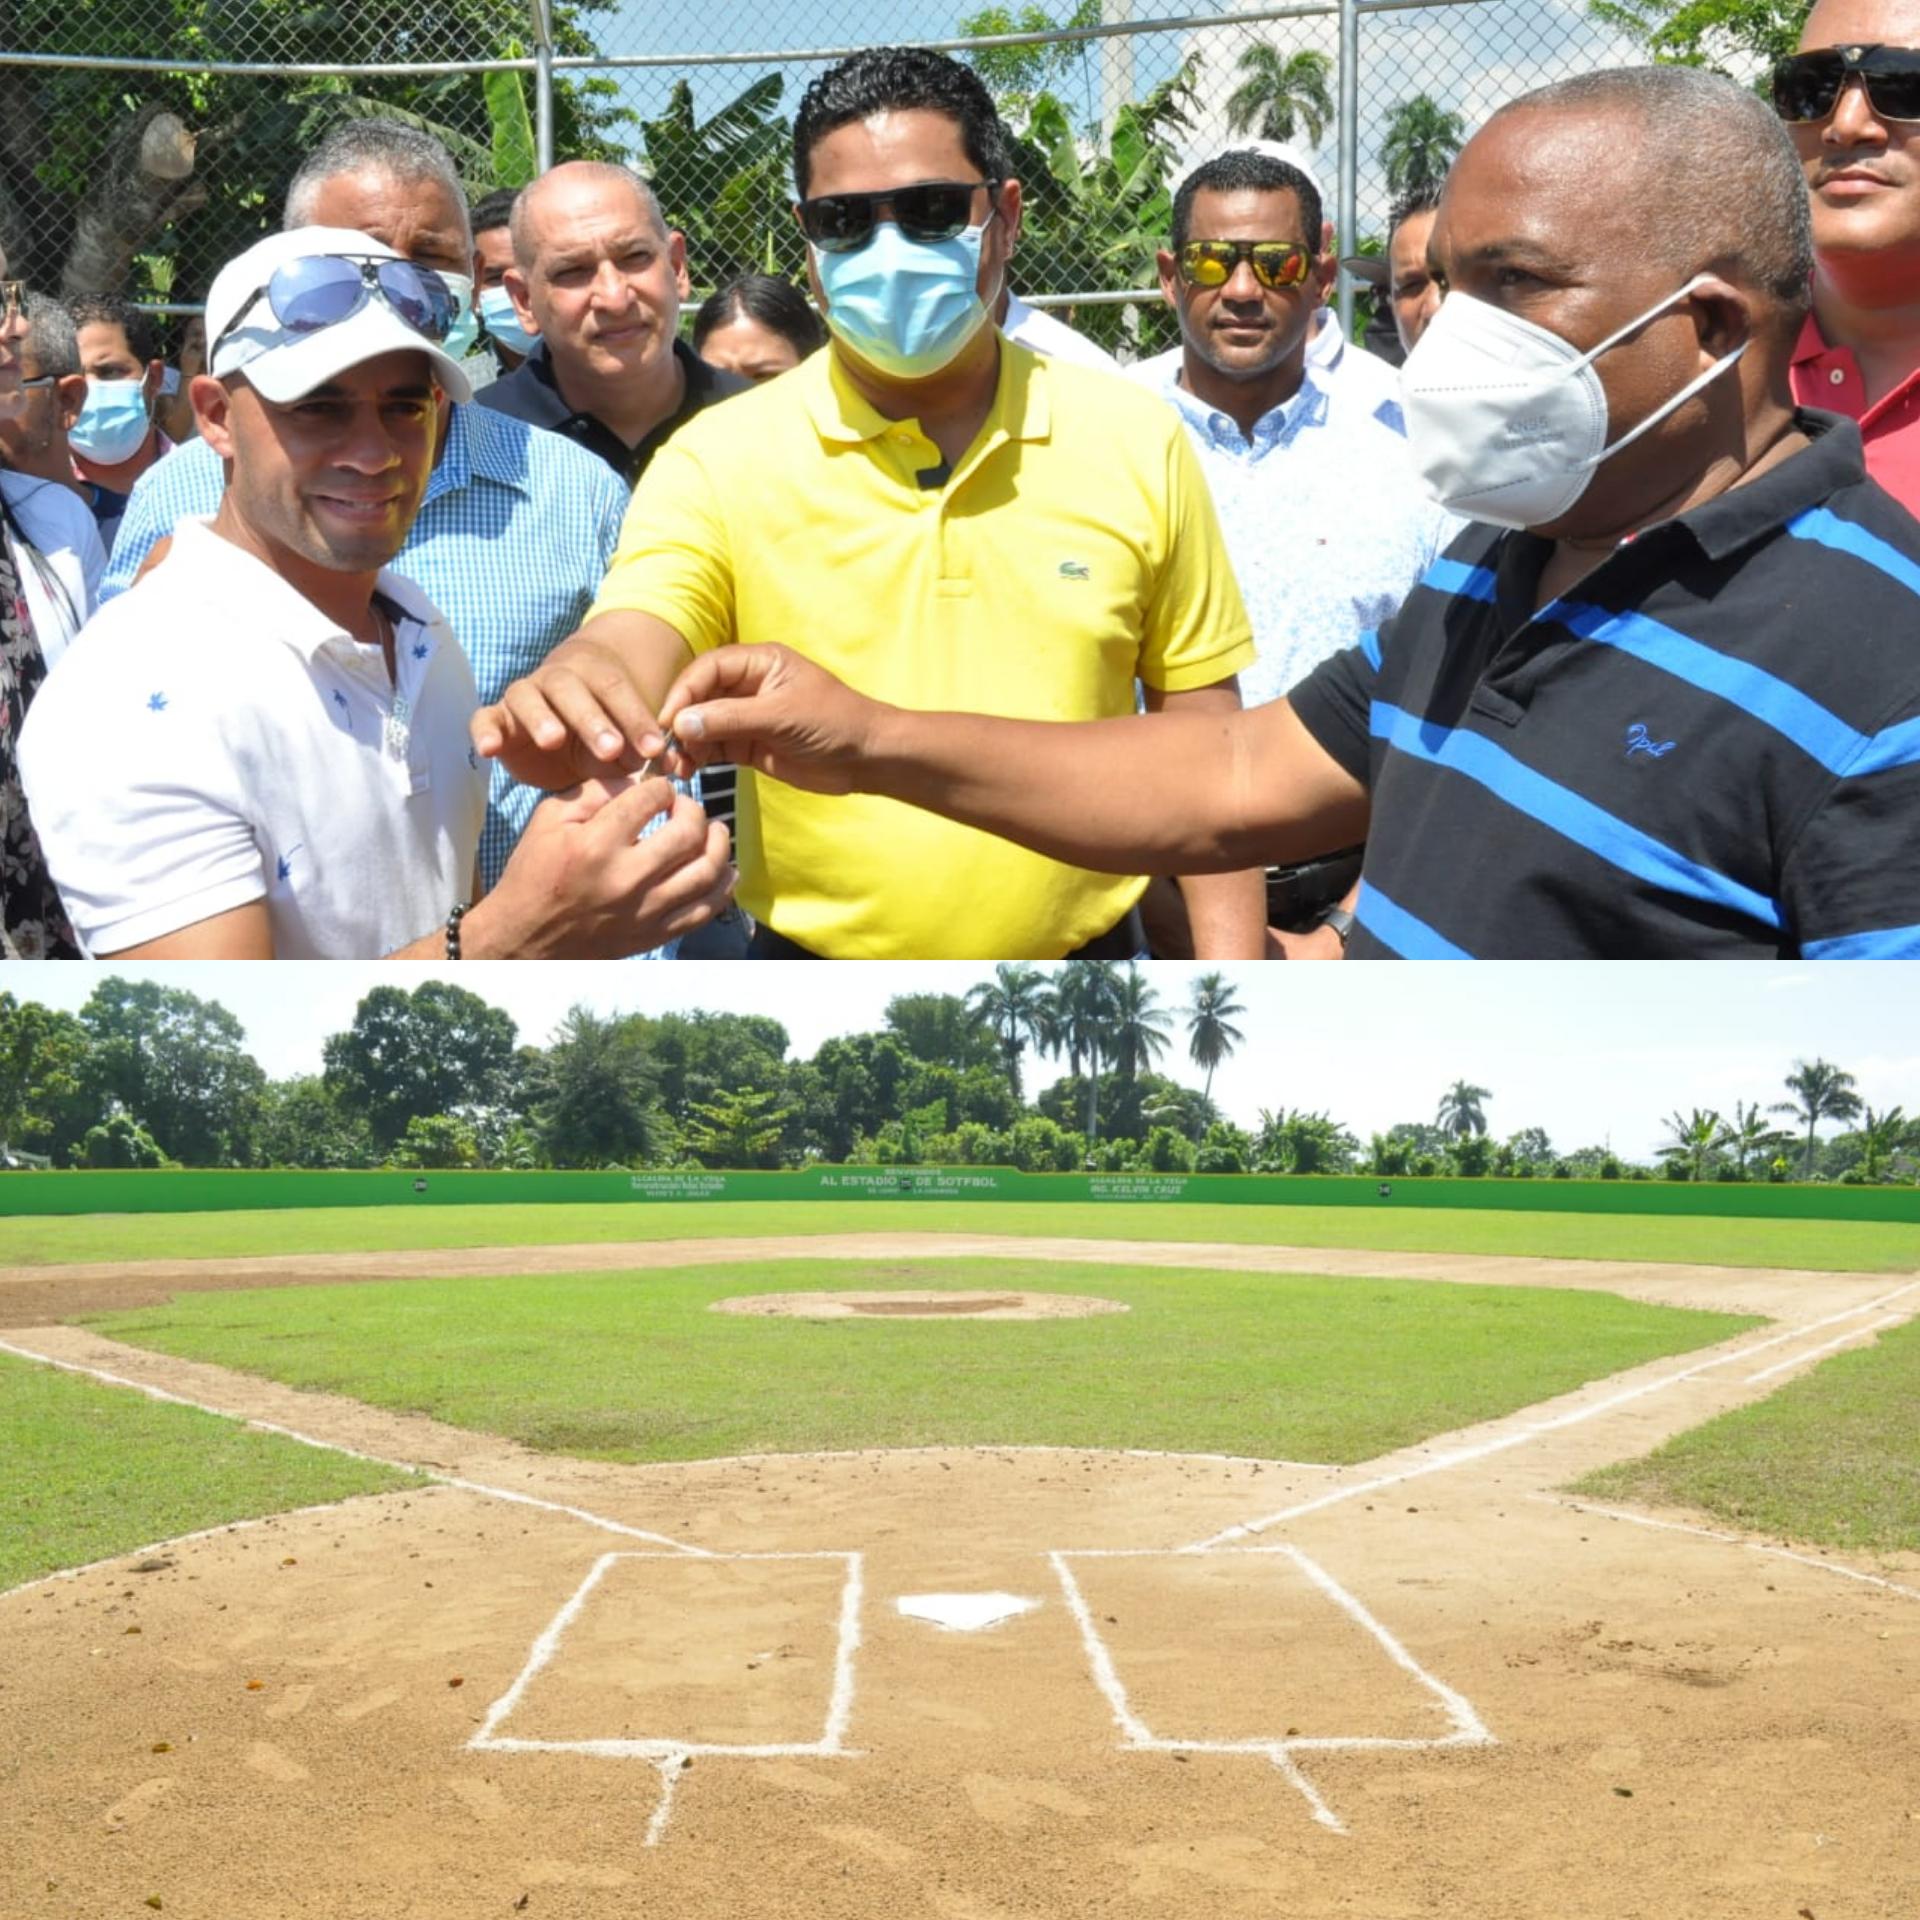 Alcalde Kelvin Cruz entrega Play de Jamo La Carmona totalmente reconstruido